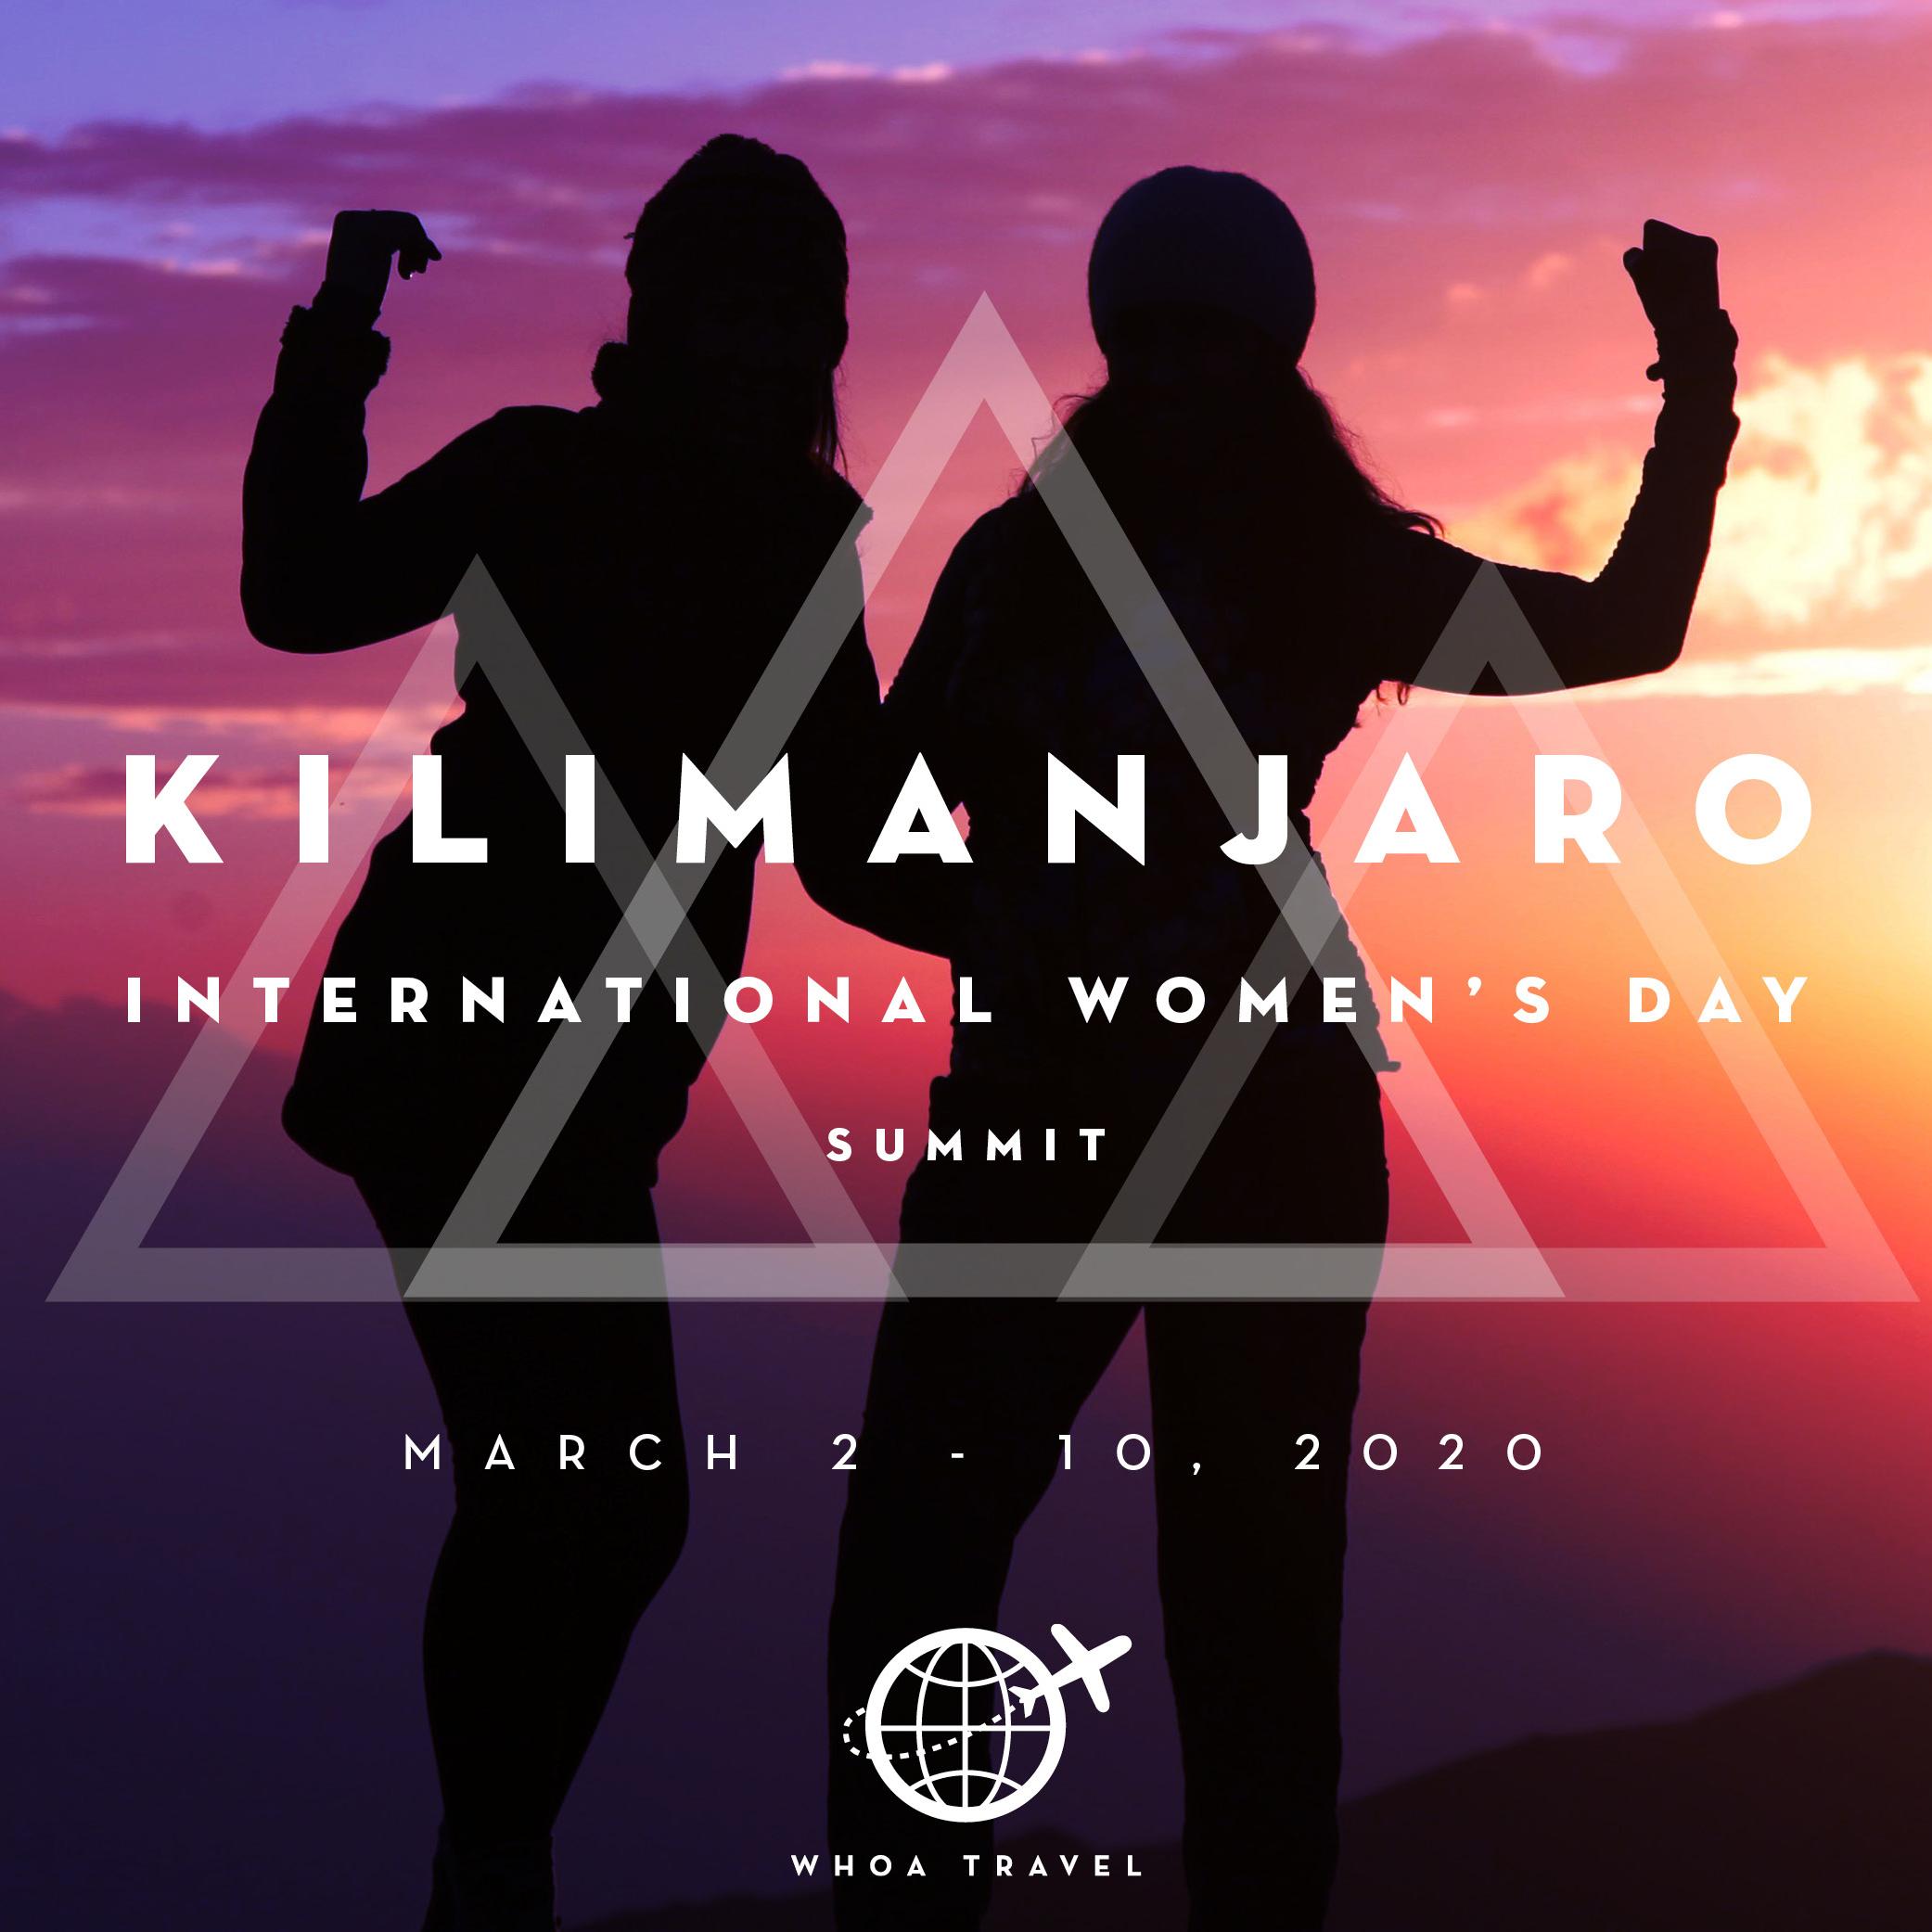 MARCH 2 - 10 - 2020KILIMANJARO: INTERNATIONAL WOMEN'S DAYfrom $3,650